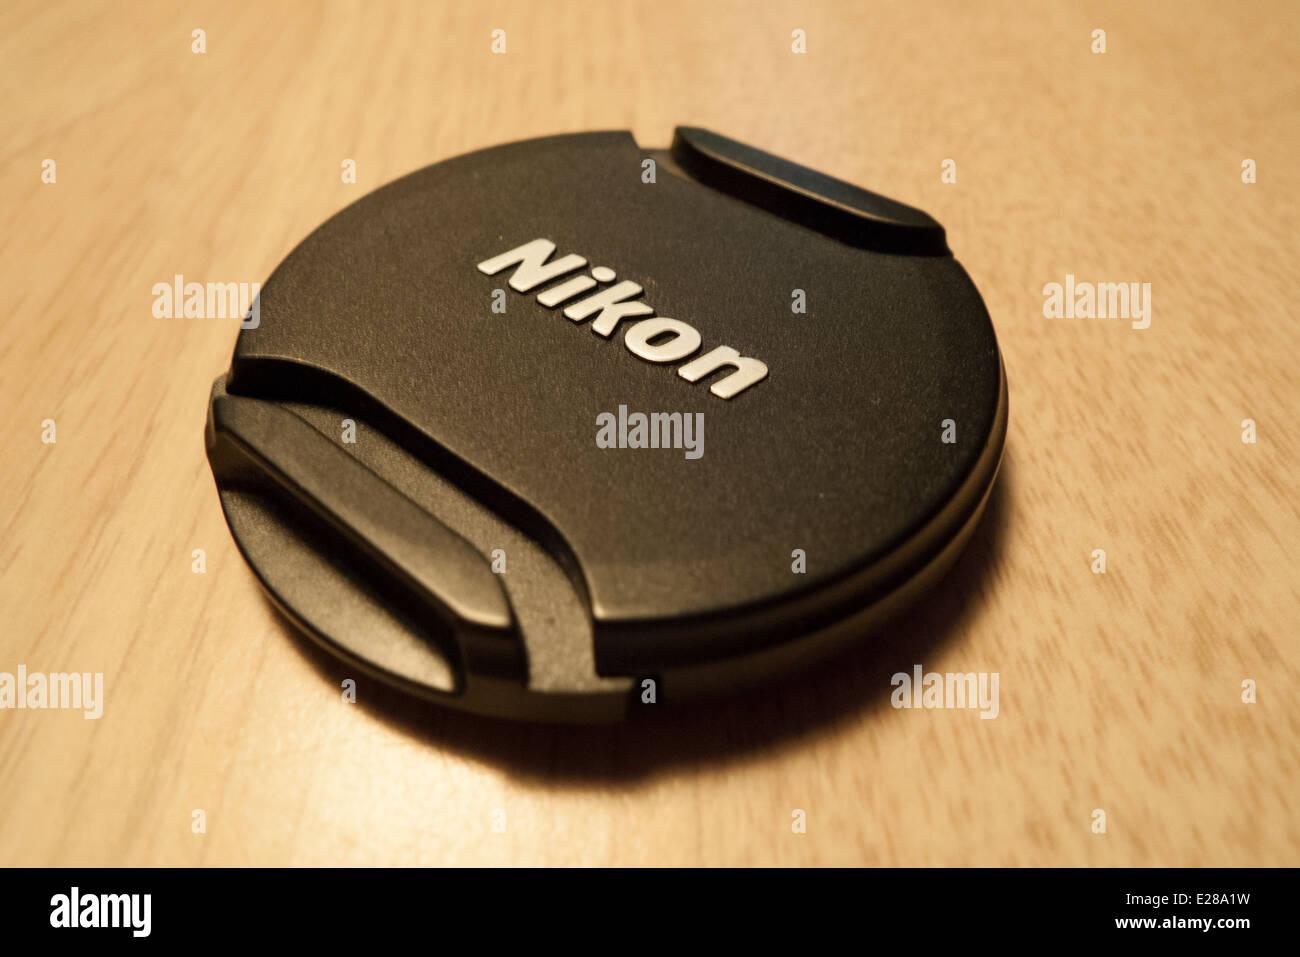 Nikon lens cap. - Stock Image